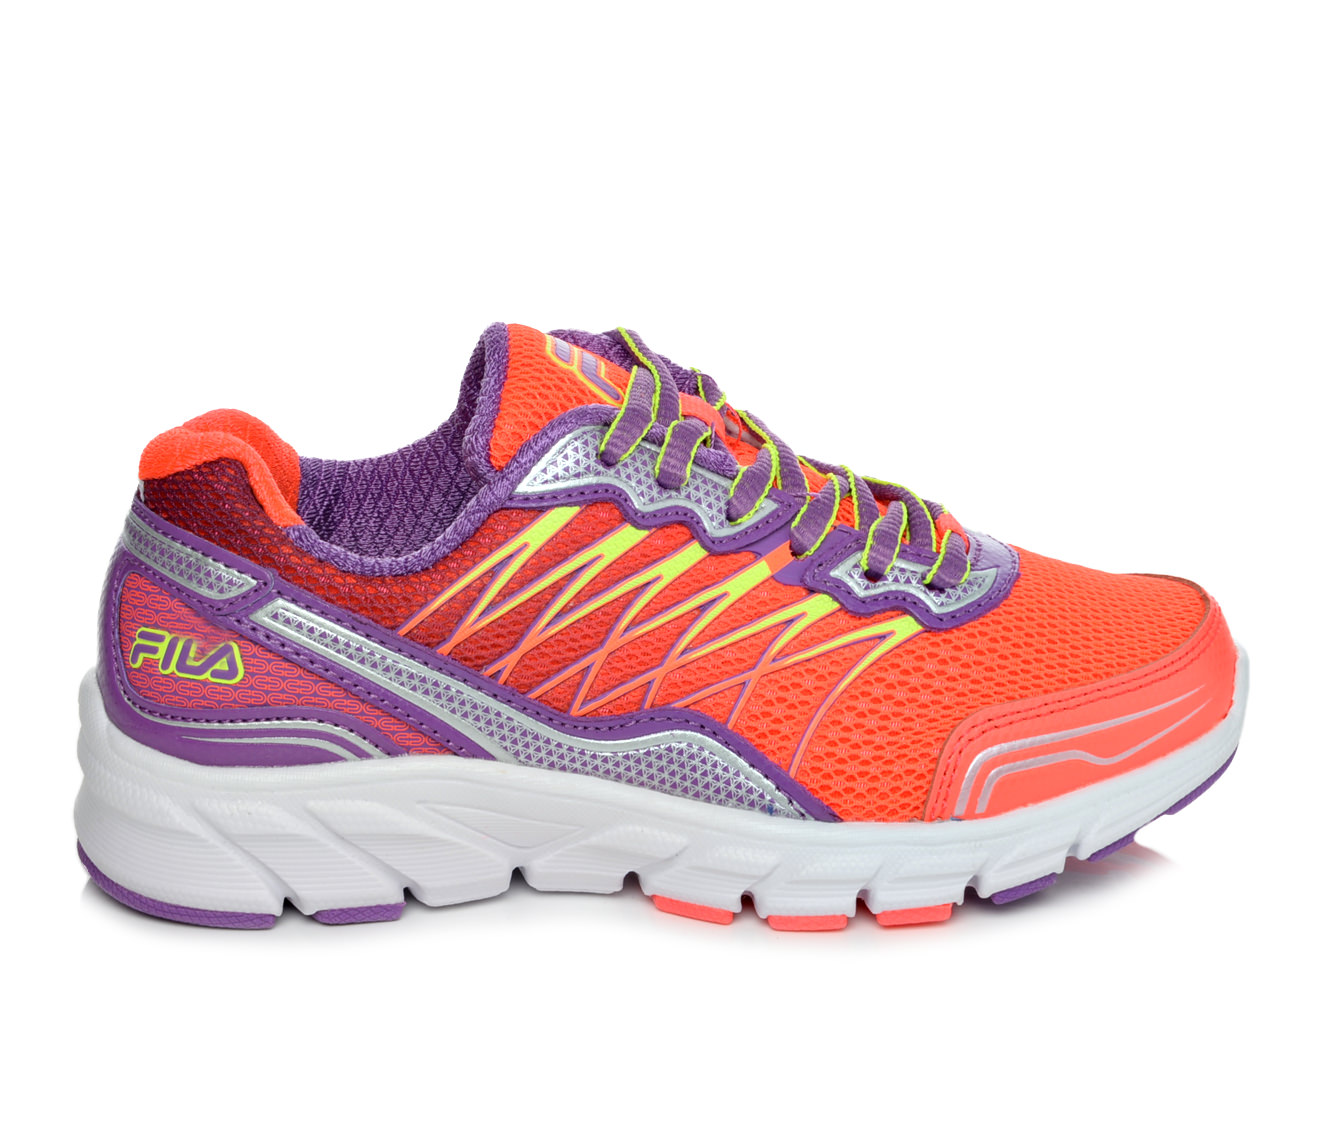 Girls' Fila Countdown 2 Running Shoes (Pink - Size 10.5 - Little Kid) 1602082